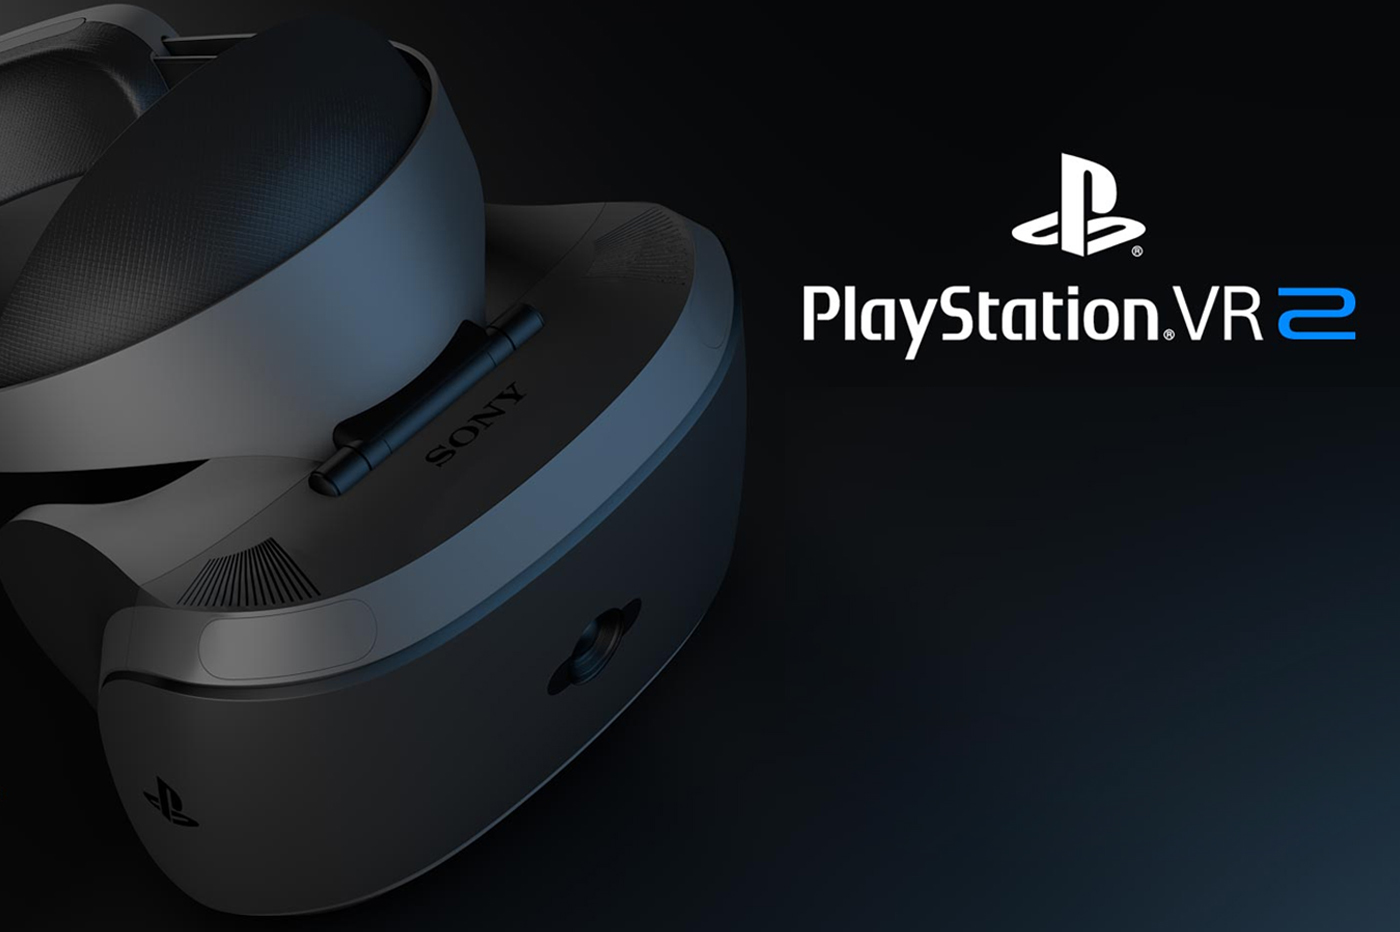 PlayStation VR 2 nouveau brevet